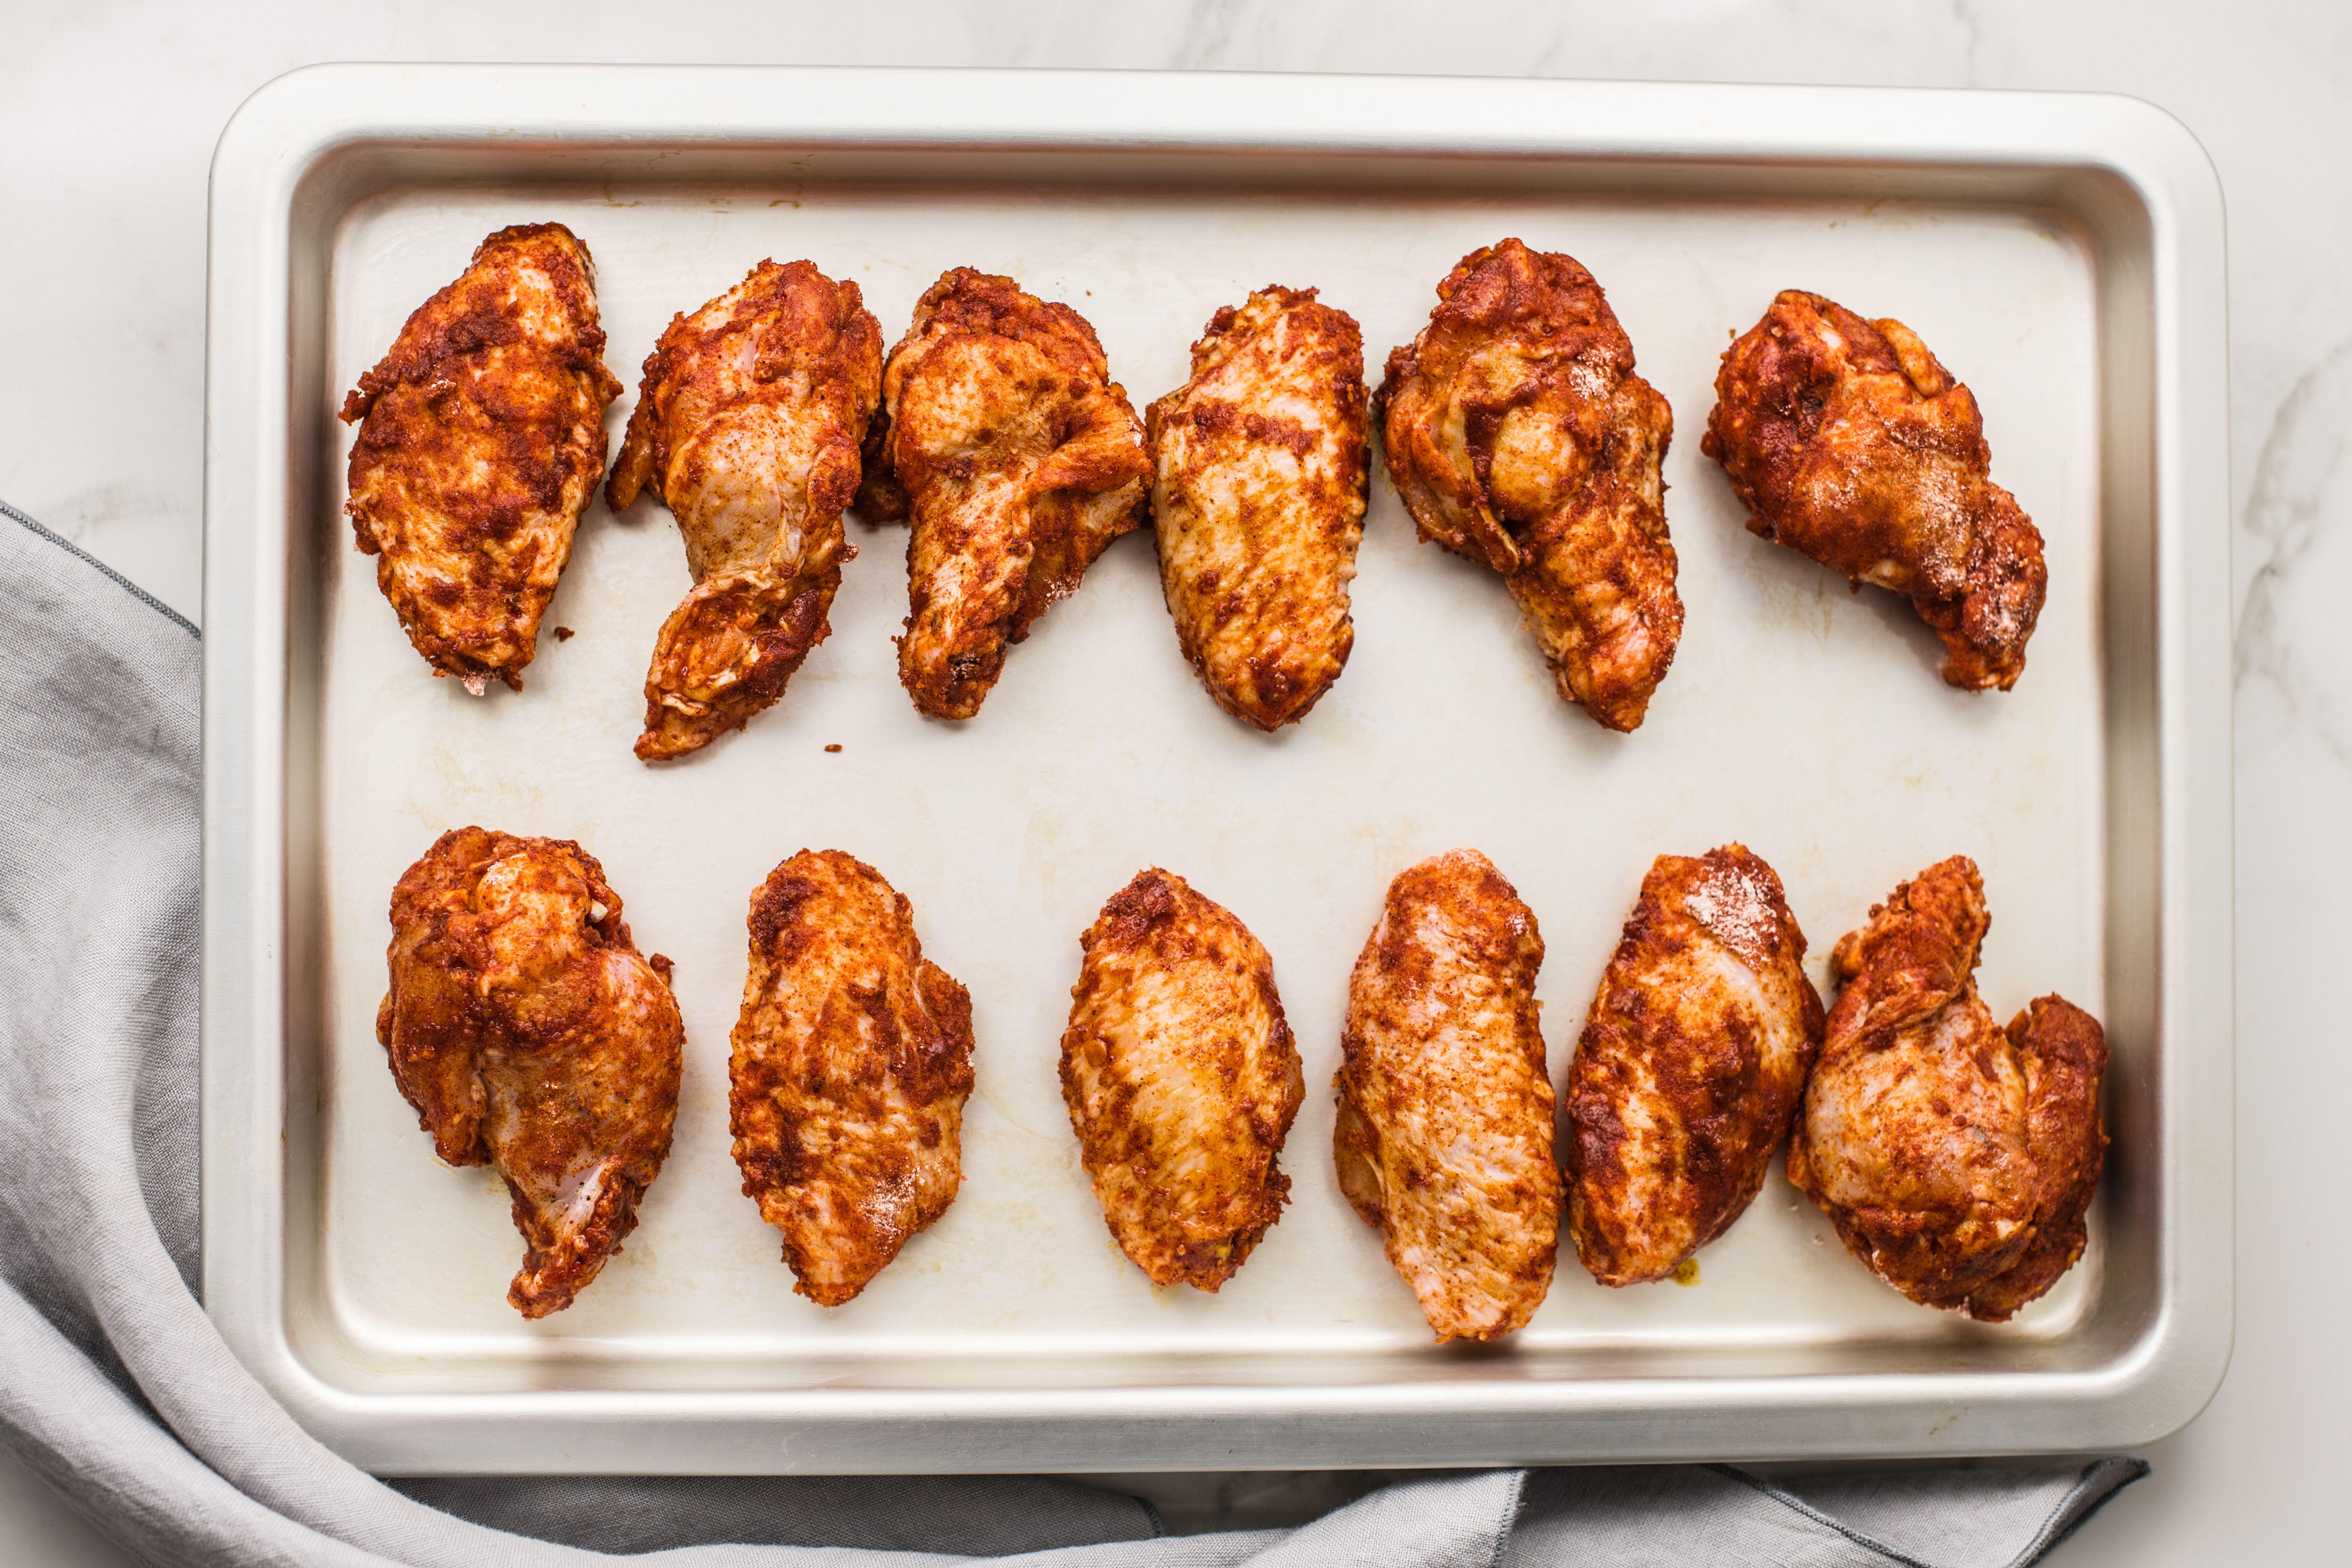 Wings on baking tray